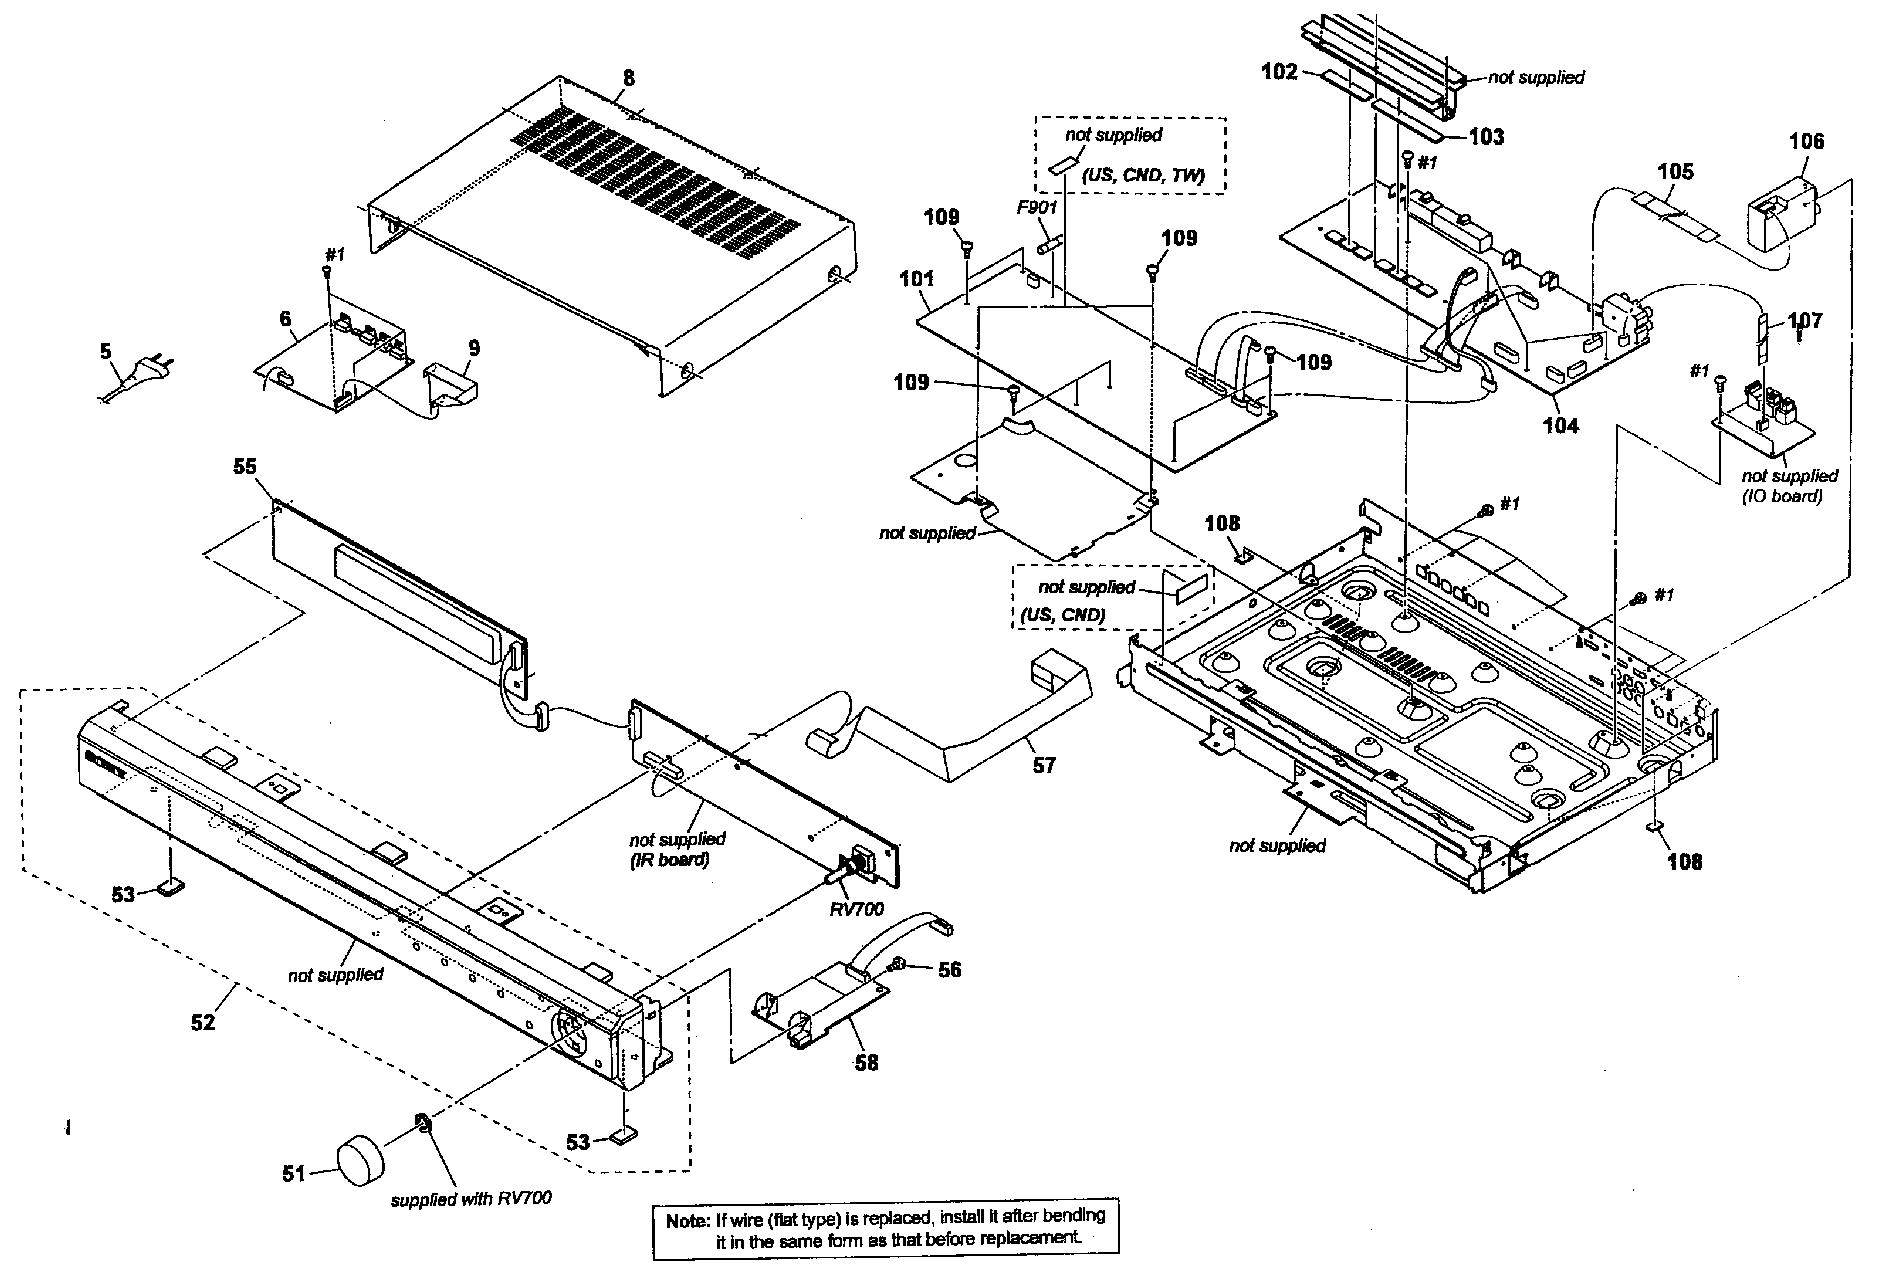 Sony model STR-KS2300 receivers genuine parts